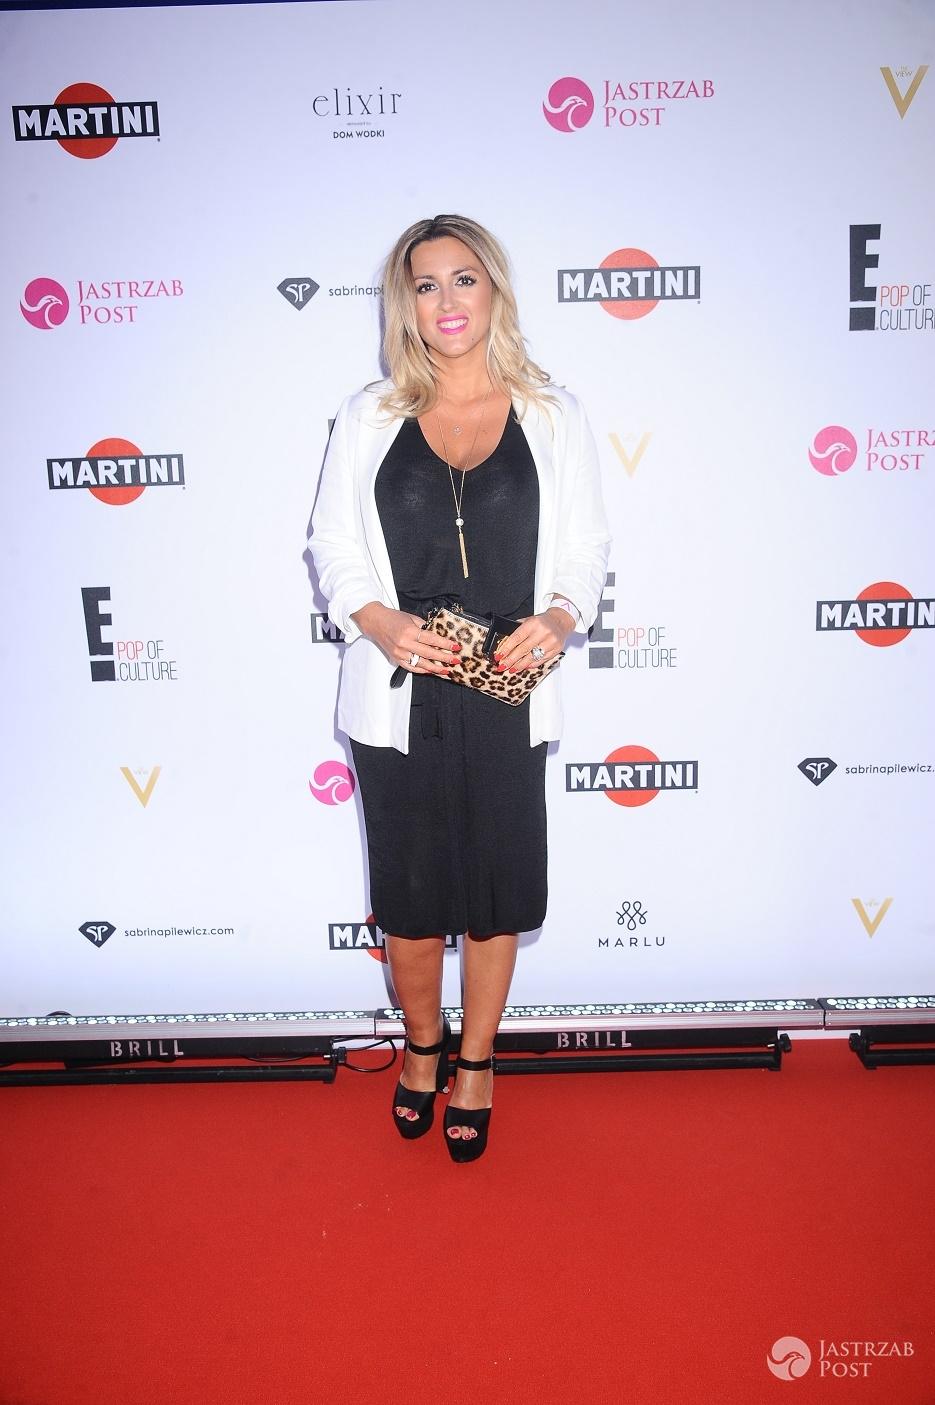 Billboard 2016, impreza z Jastrząb Post, Martini i E! Entertainment - Karolina Szostak